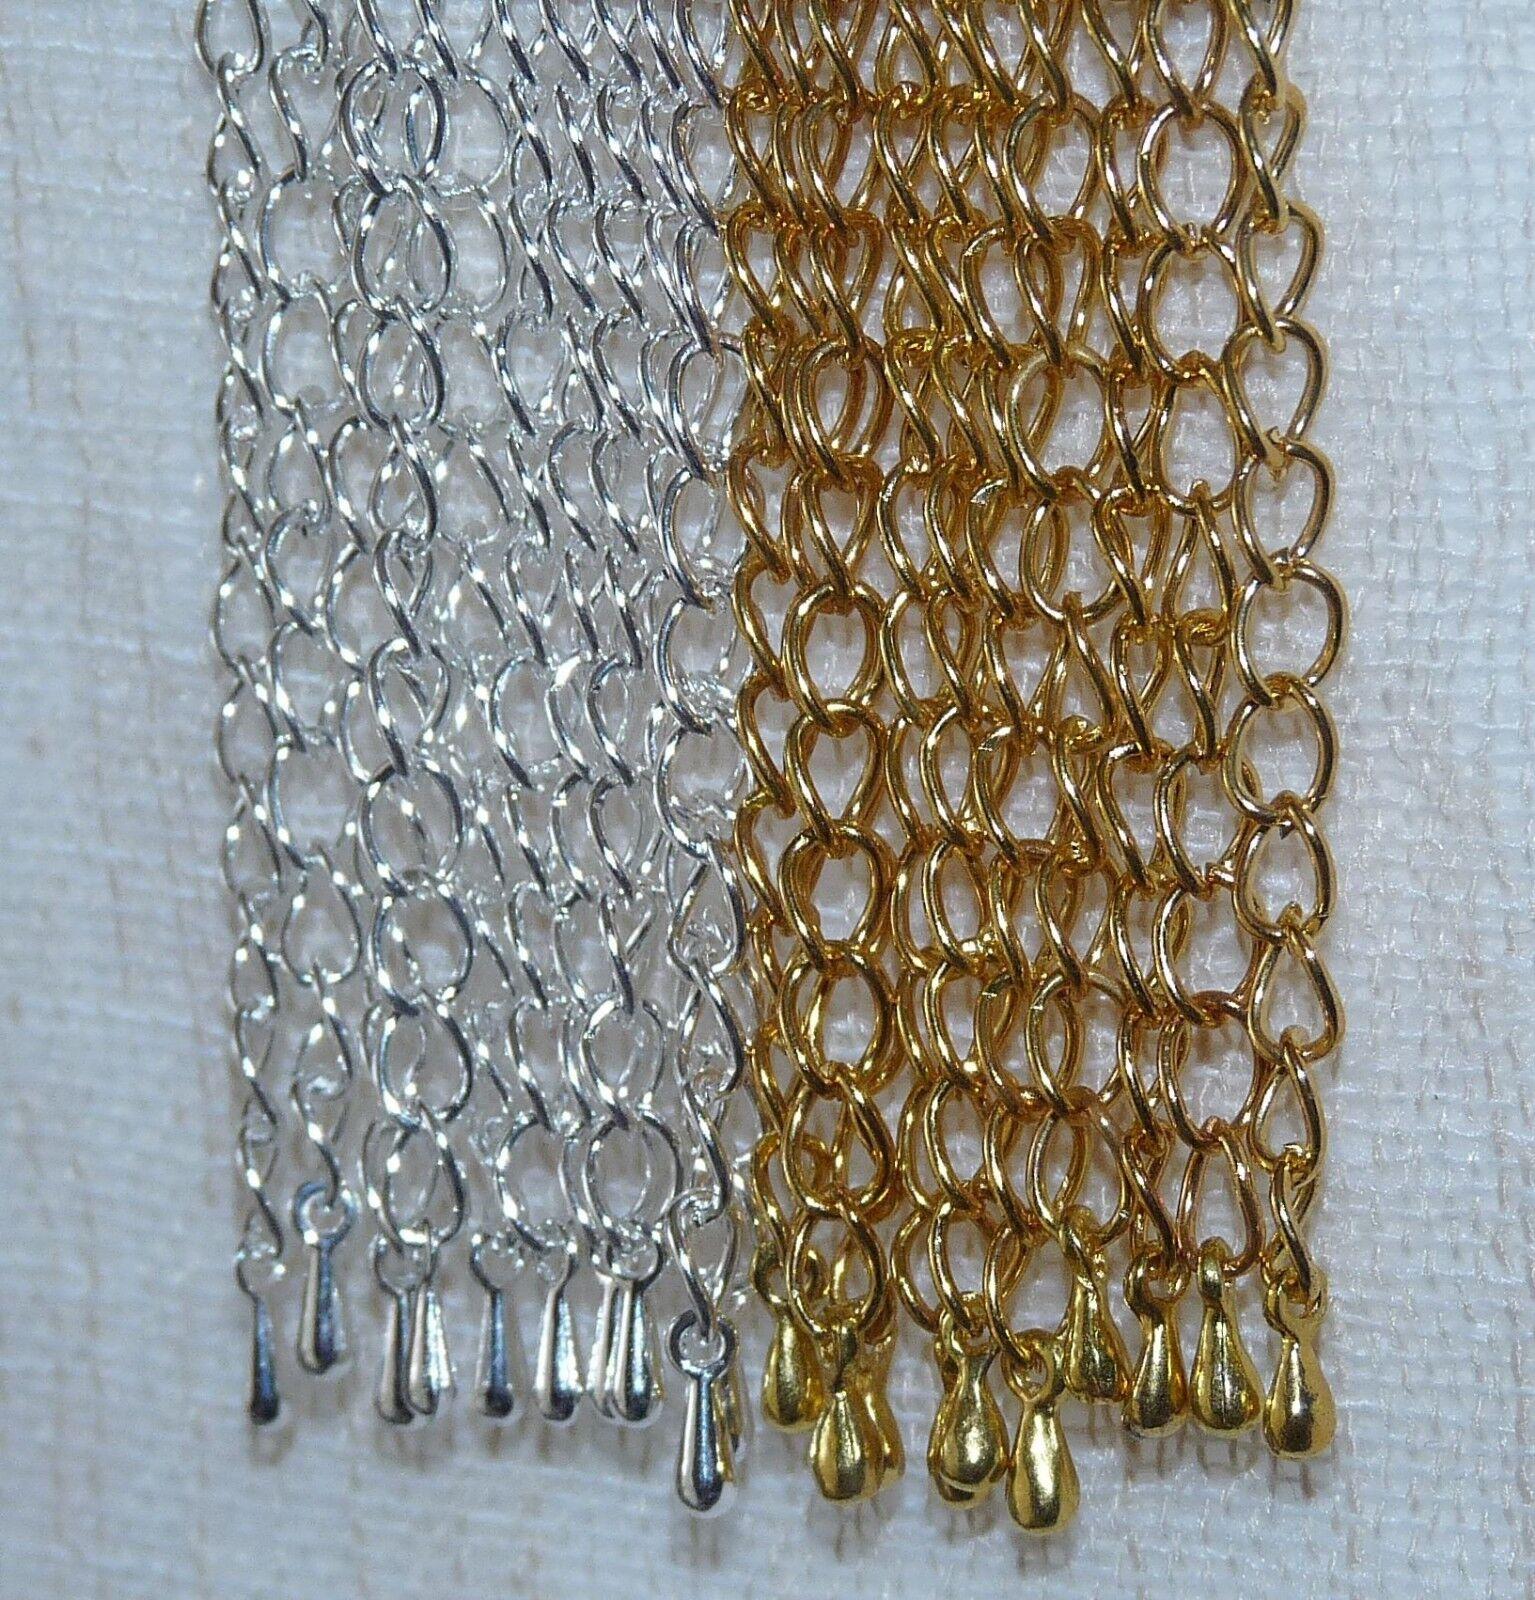 Extension Chain Silver Necklace Pendant Plated Extender Bracelet Connector DIY